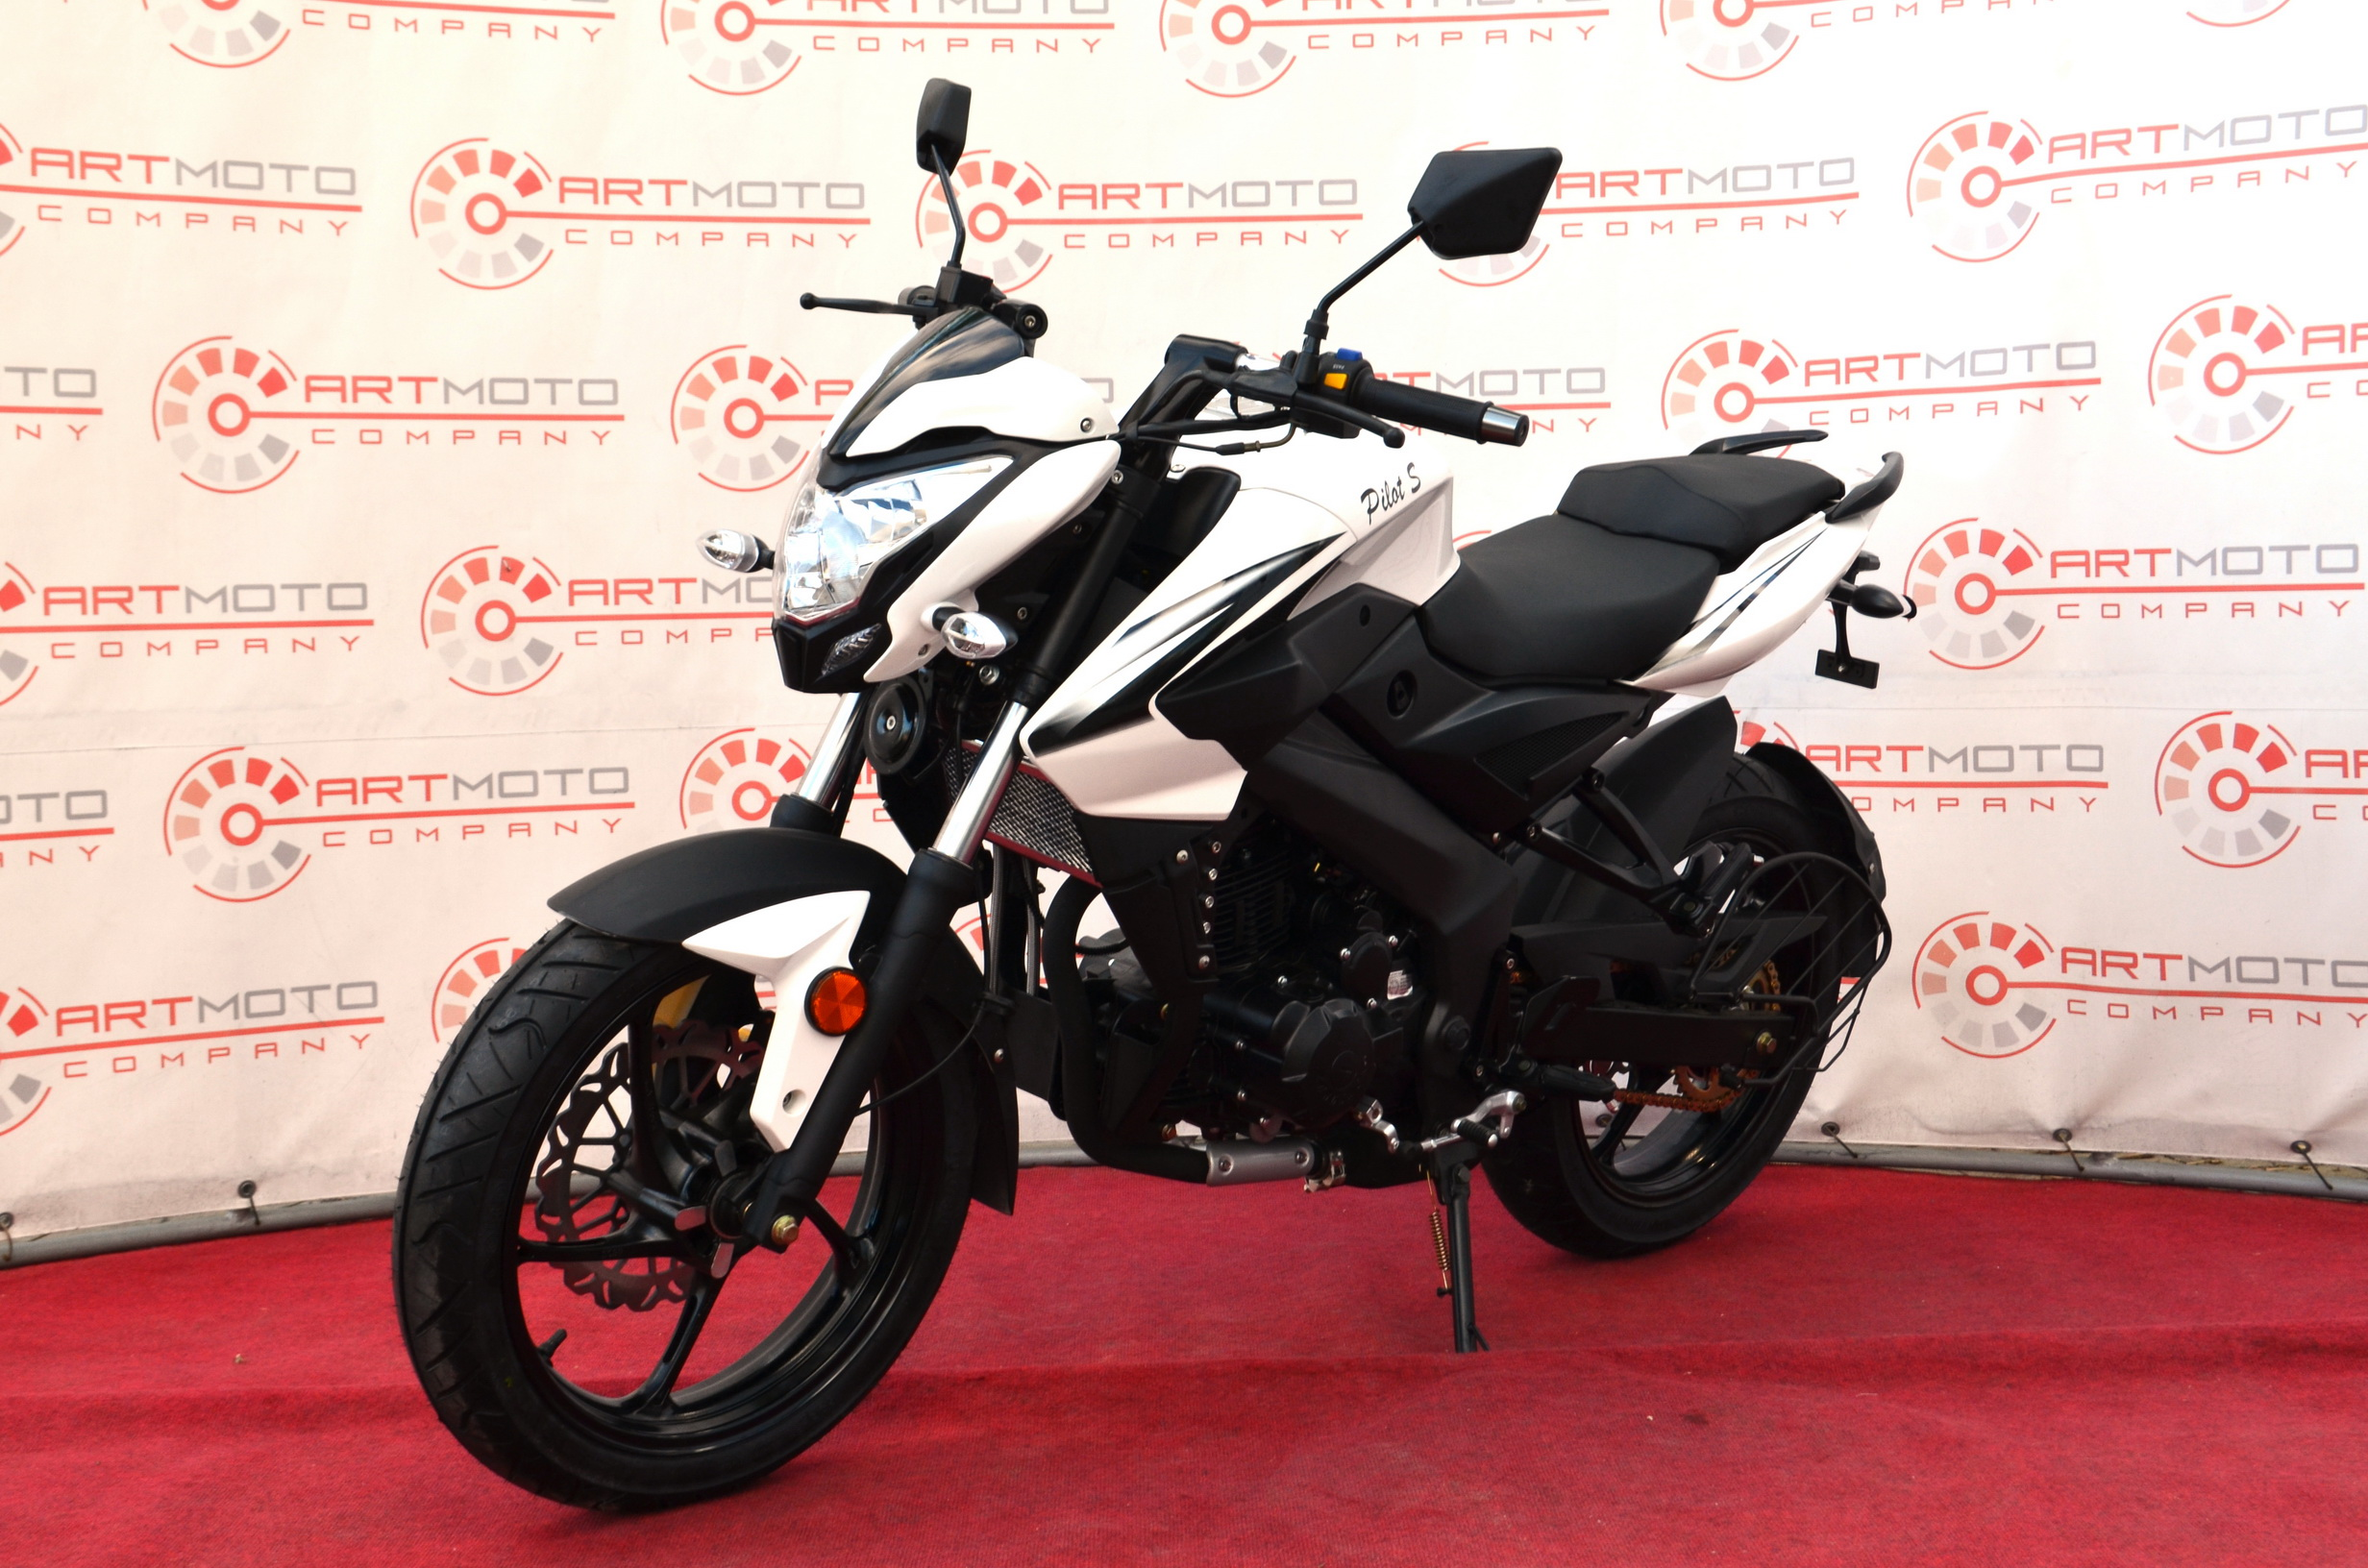 МОТОЦИКЛ BASHAN PILOT S 250 White  Артмото - купить квадроцикл в украине и харькове, мотоцикл, снегоход, скутер, мопед, электромобиль